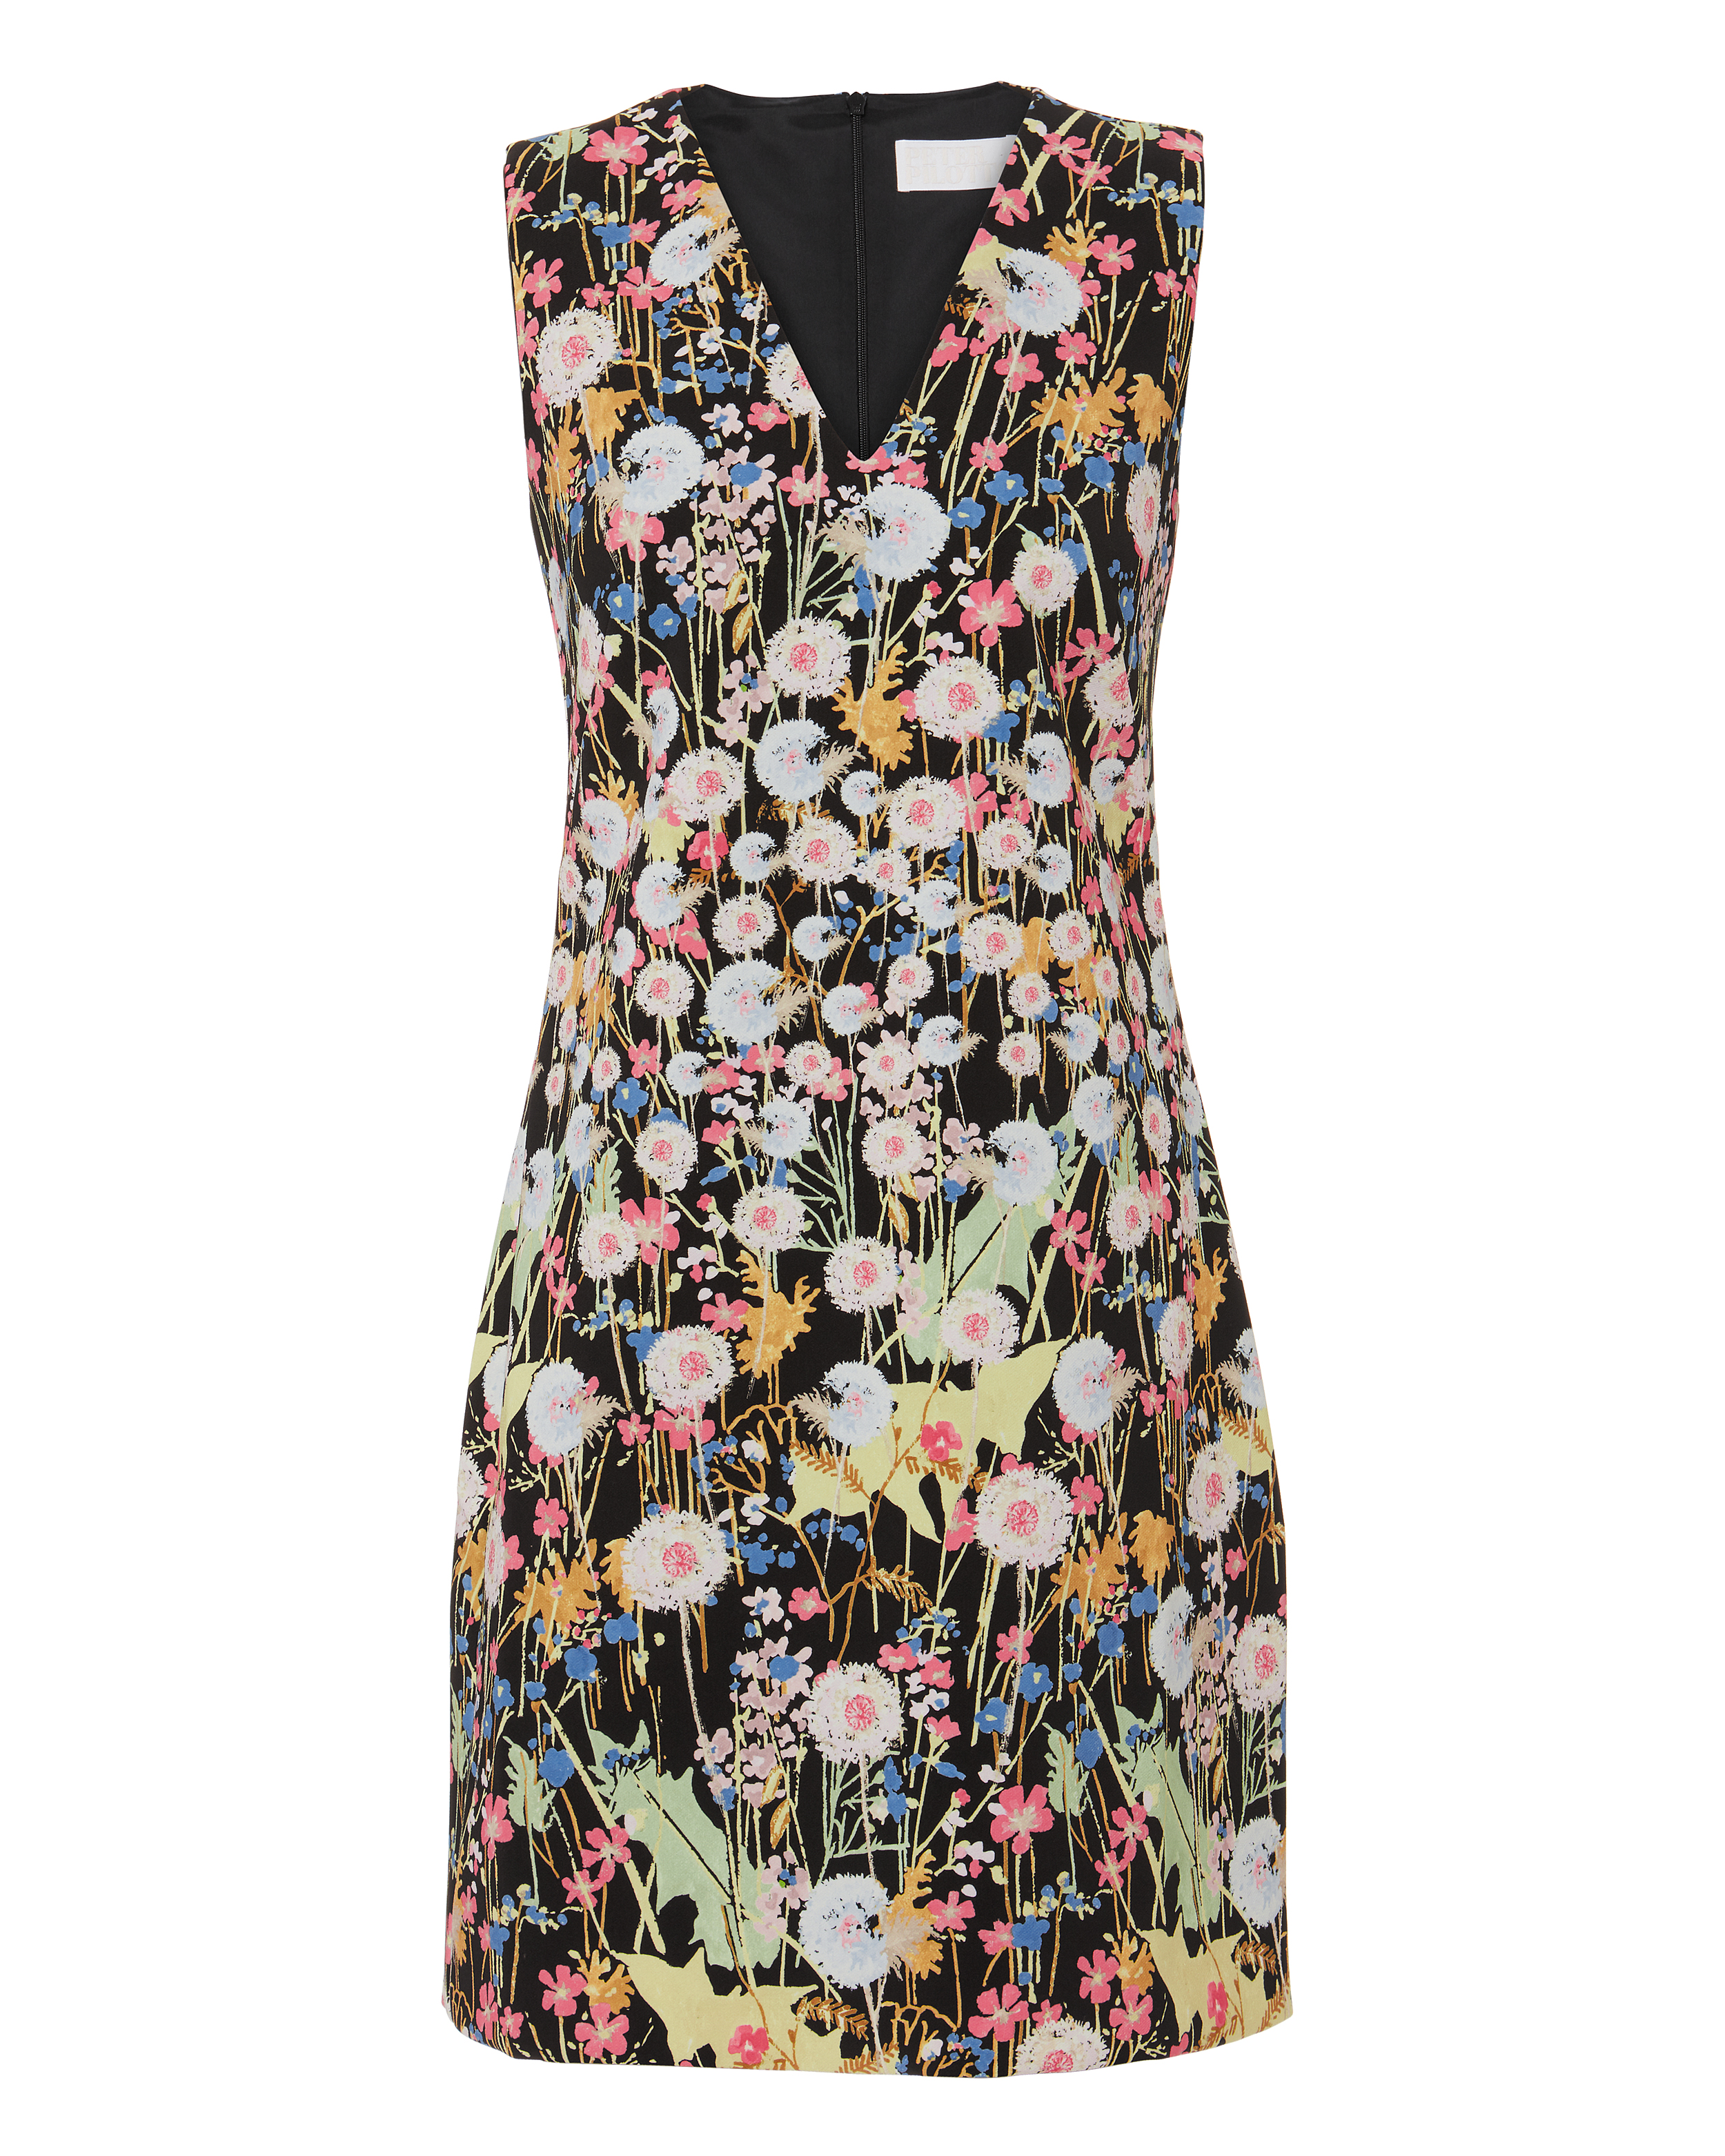 Cady Floral Mini Dress